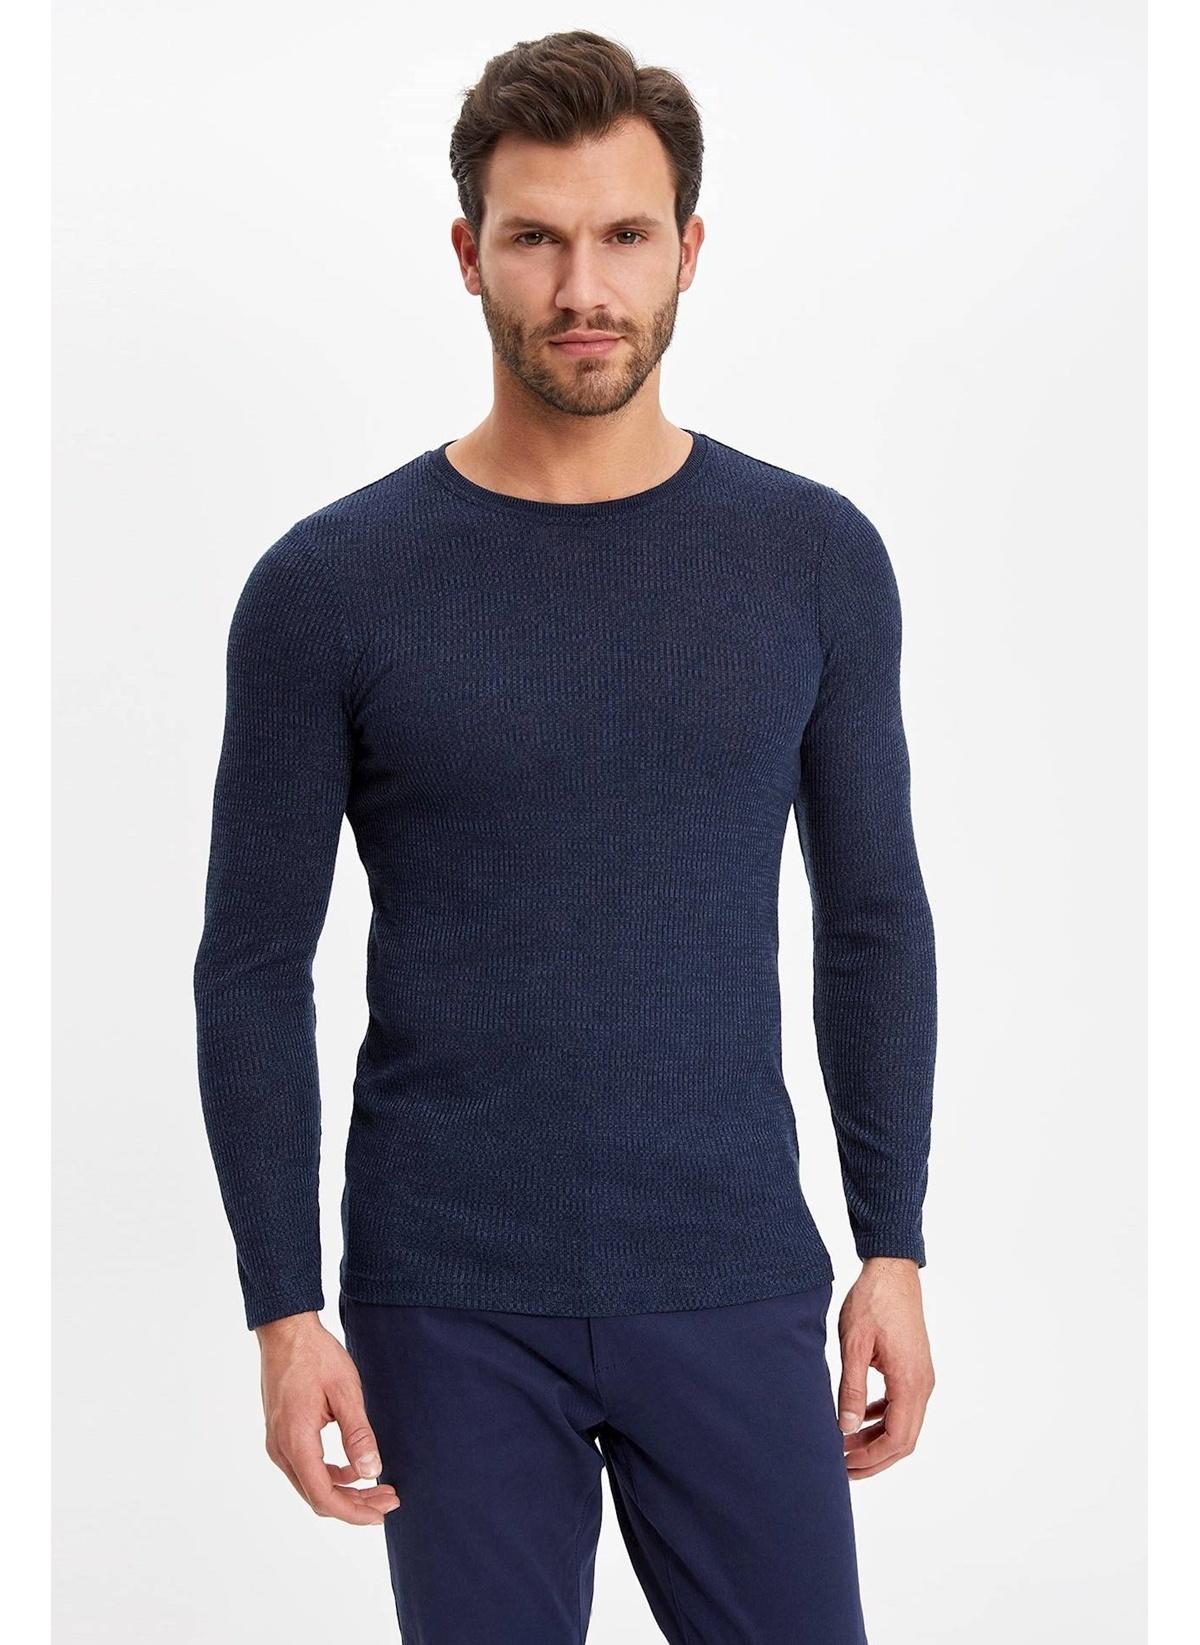 Defacto Uzun Kollu Kaşkorse Slim Fit T-shirt K0120az19spnv57t-shirt – 44.99 TL